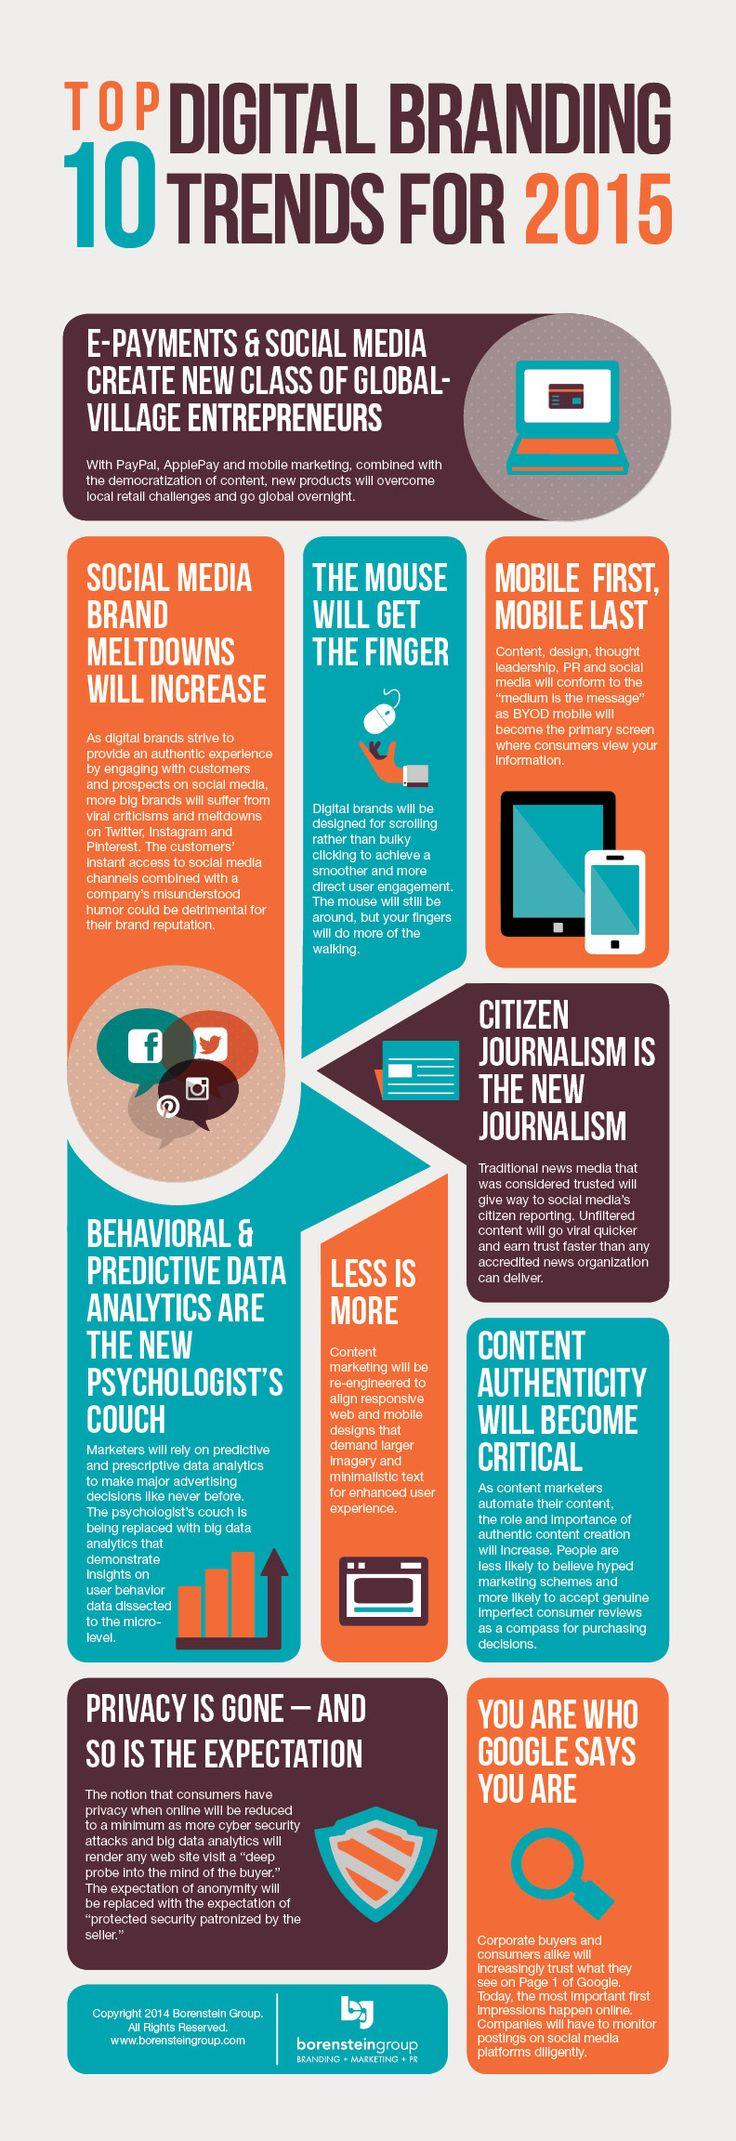 Top 10 Digital Branding & Marketing Trends to Watch in 2015 (Infographic) | via #BornToBeSocial, Pinterest Marketing | http://borntobesocial.com